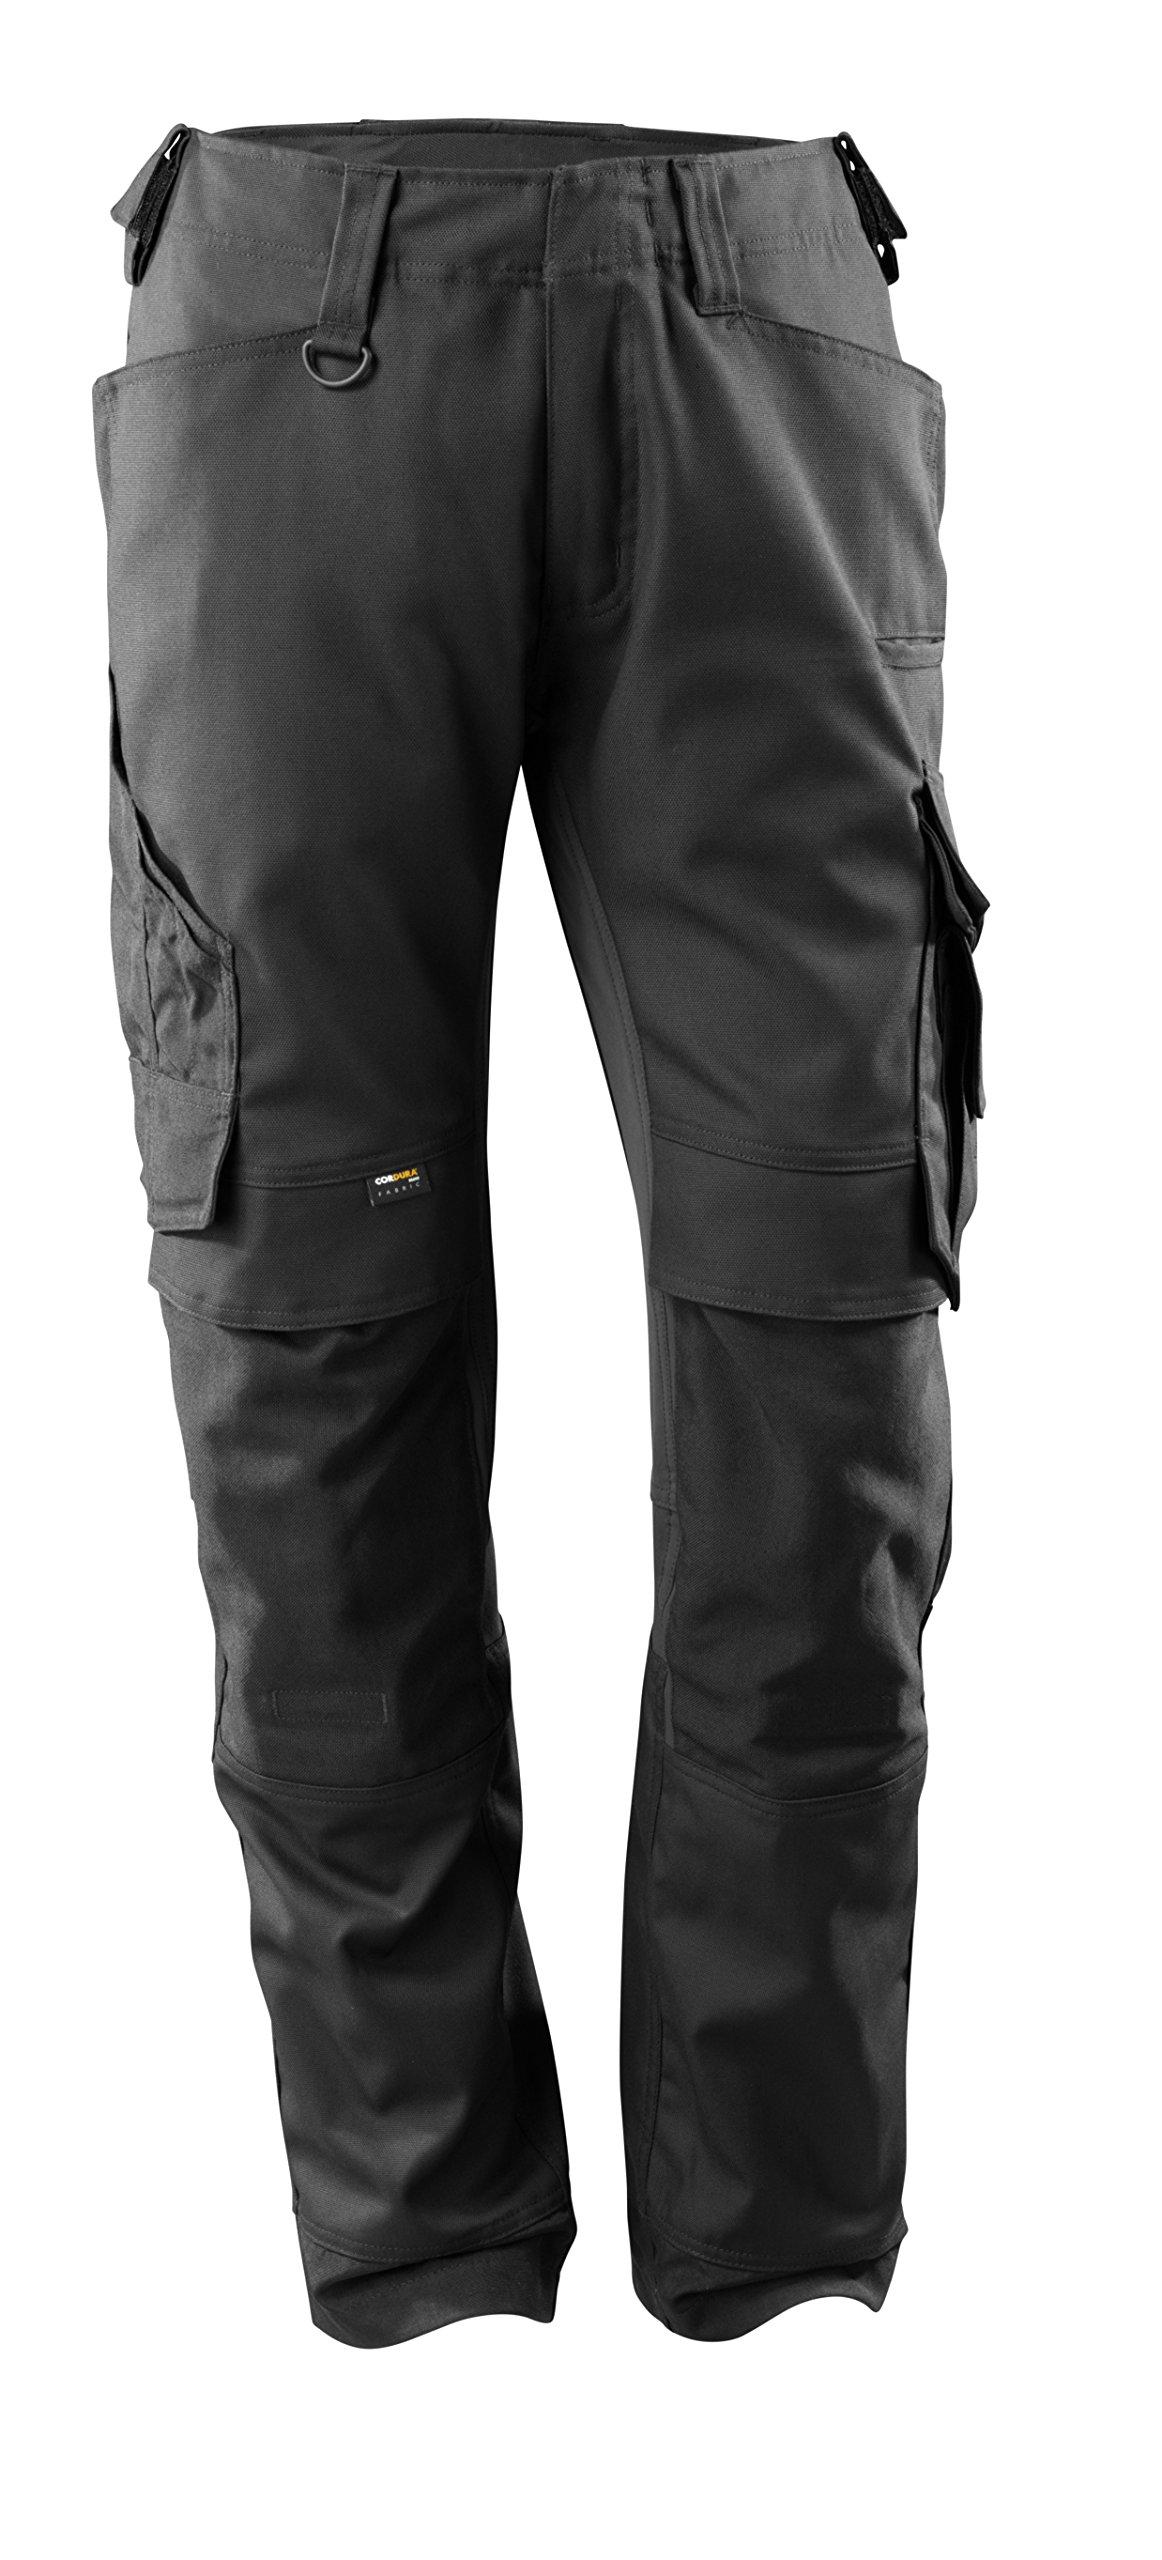 Mascot 15079-010-09-82C54 ''Adra'' Trousers, L82cm/C54, Black